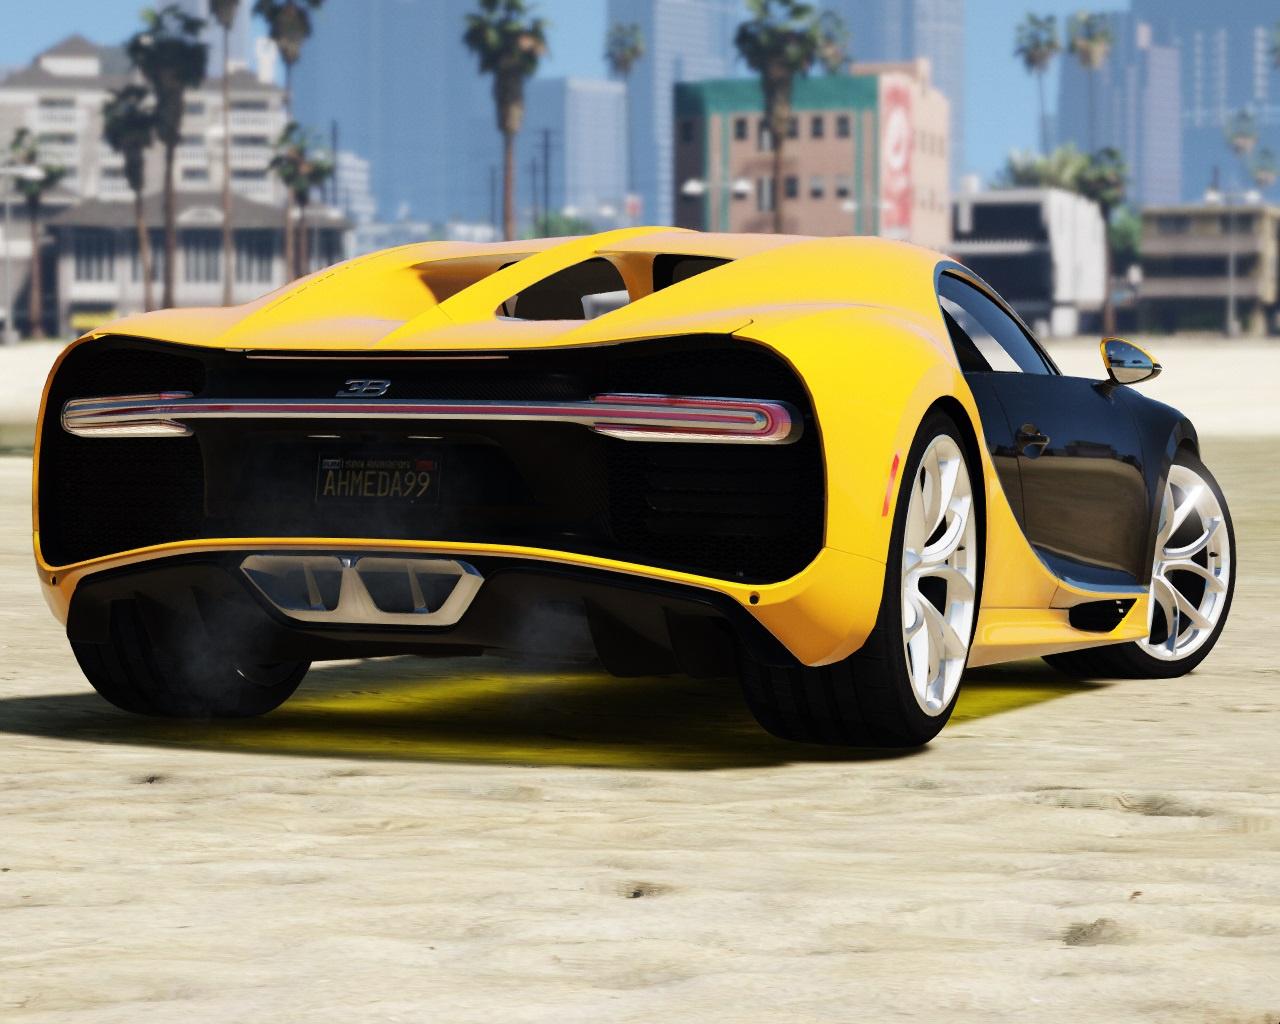 2017 Bugatti Chiron (Retexture) Add-On / Replace  - GTA5-Mods.com